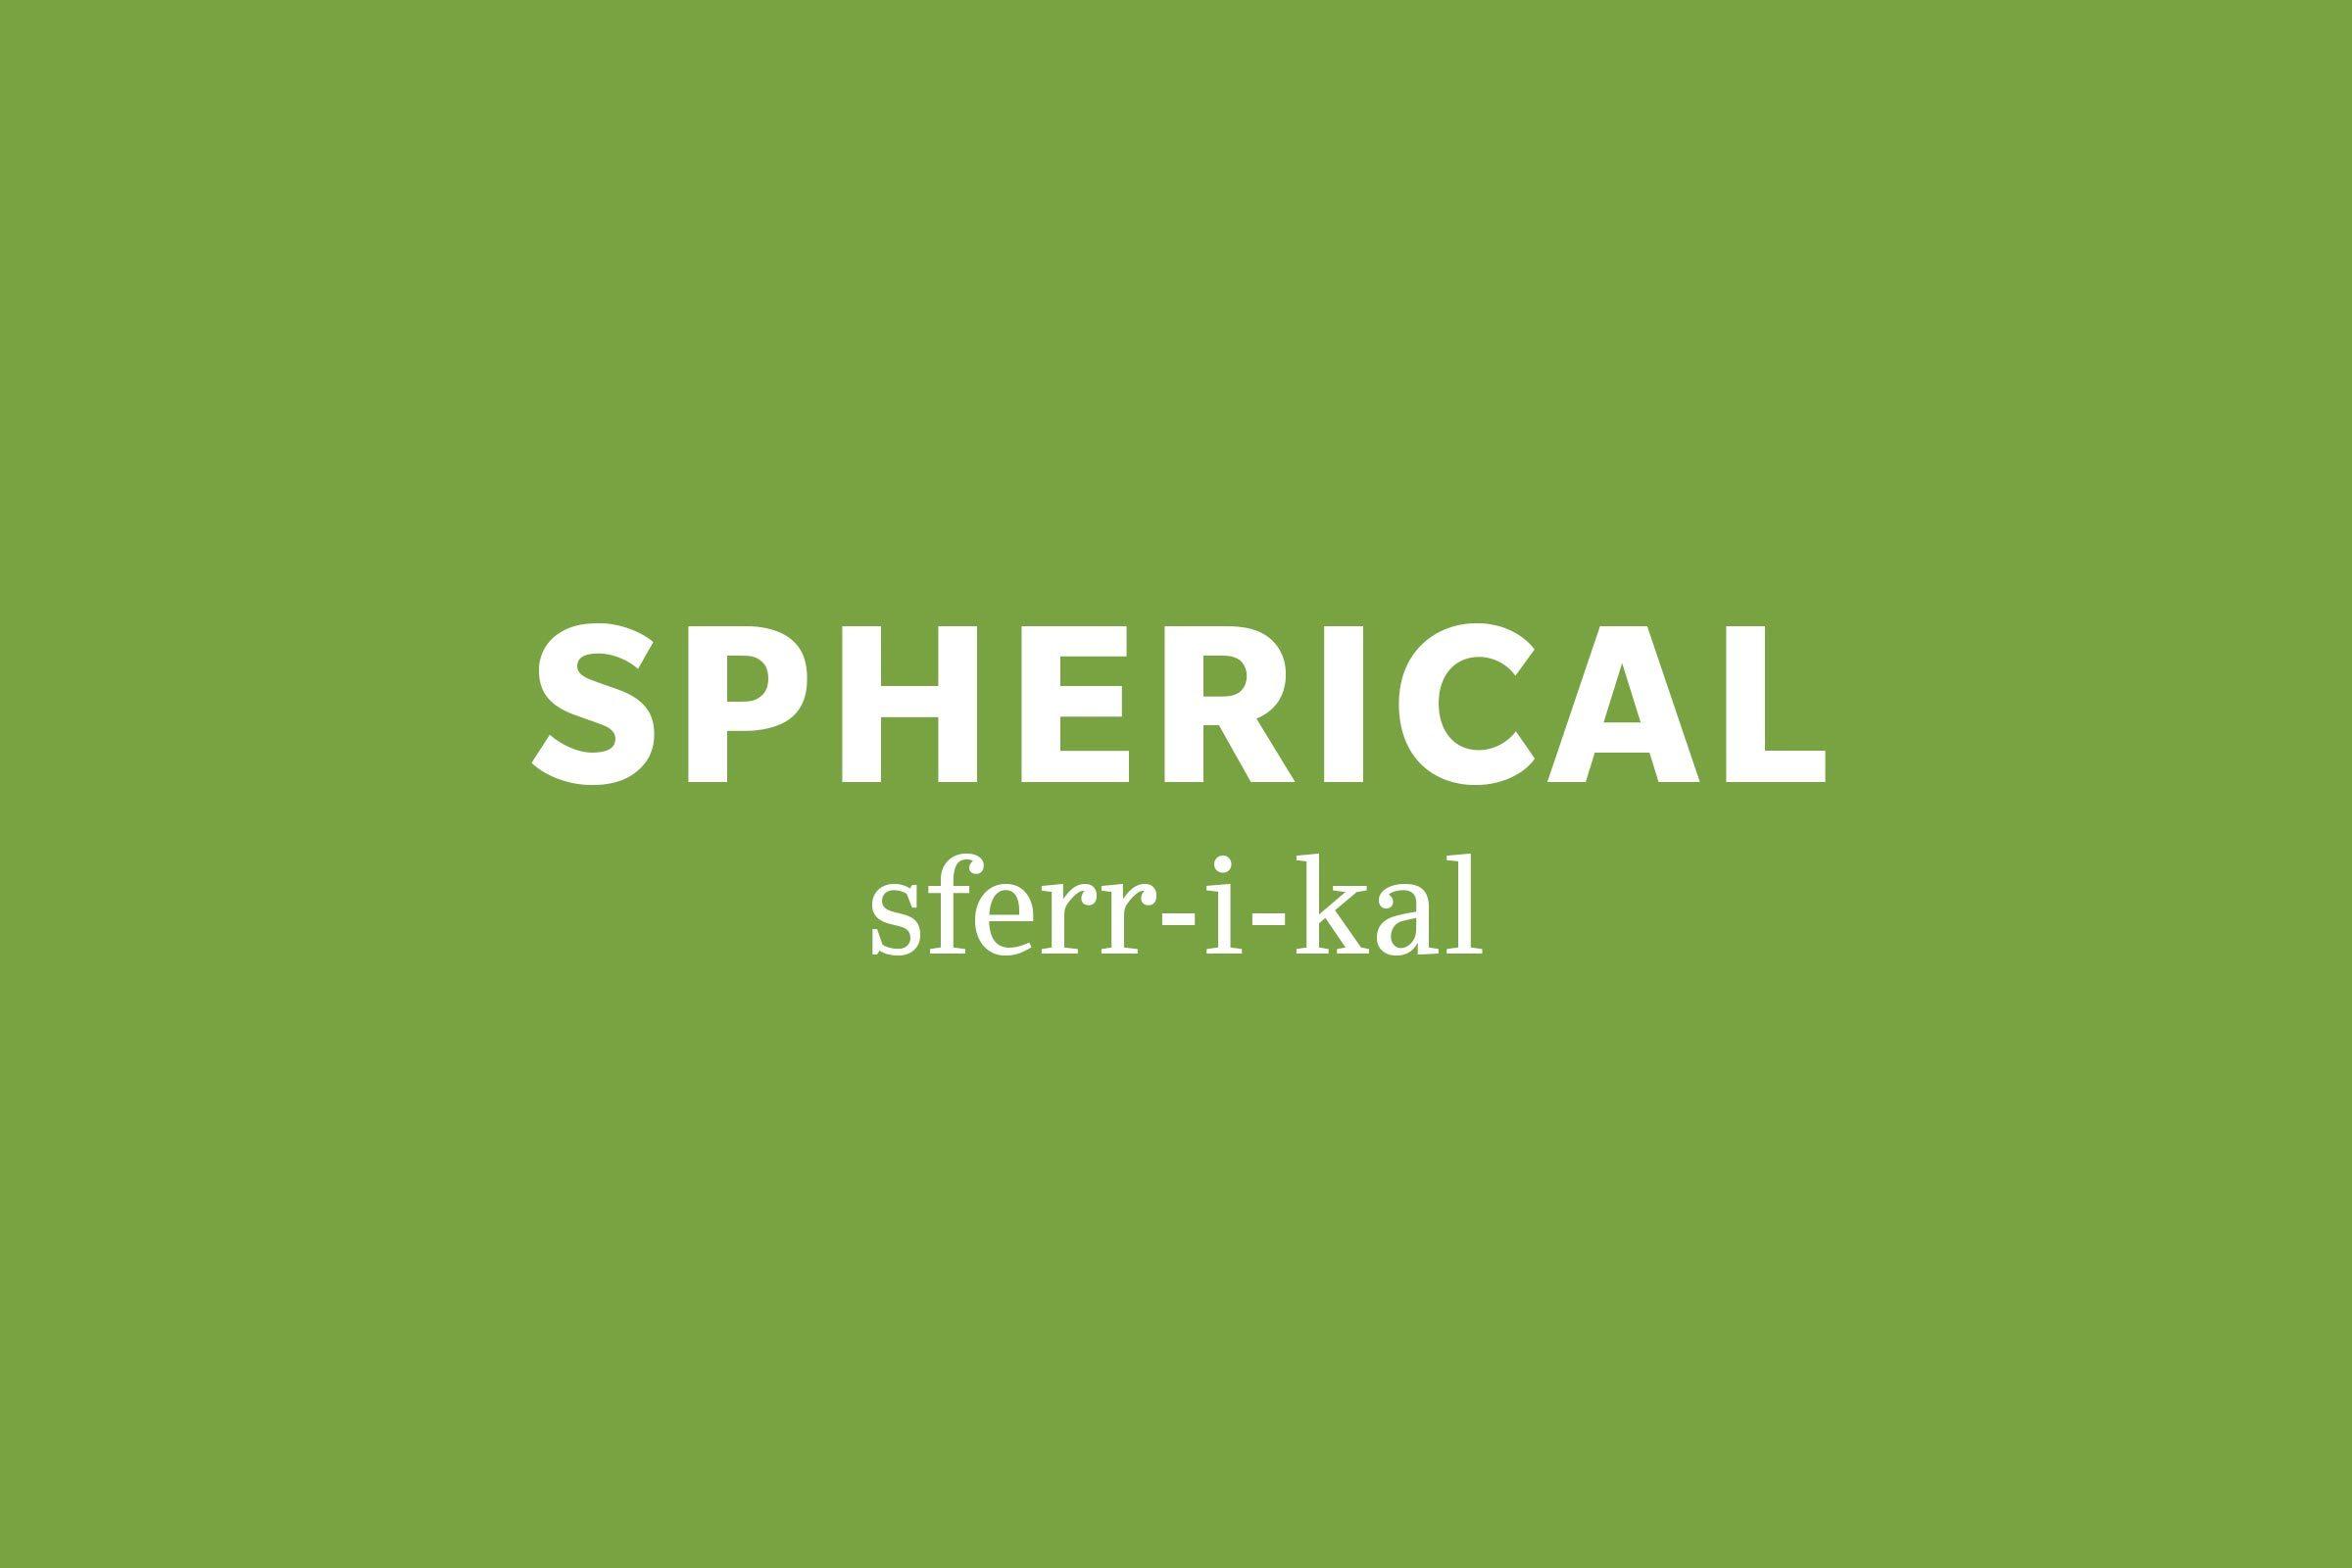 spherical pronunciation